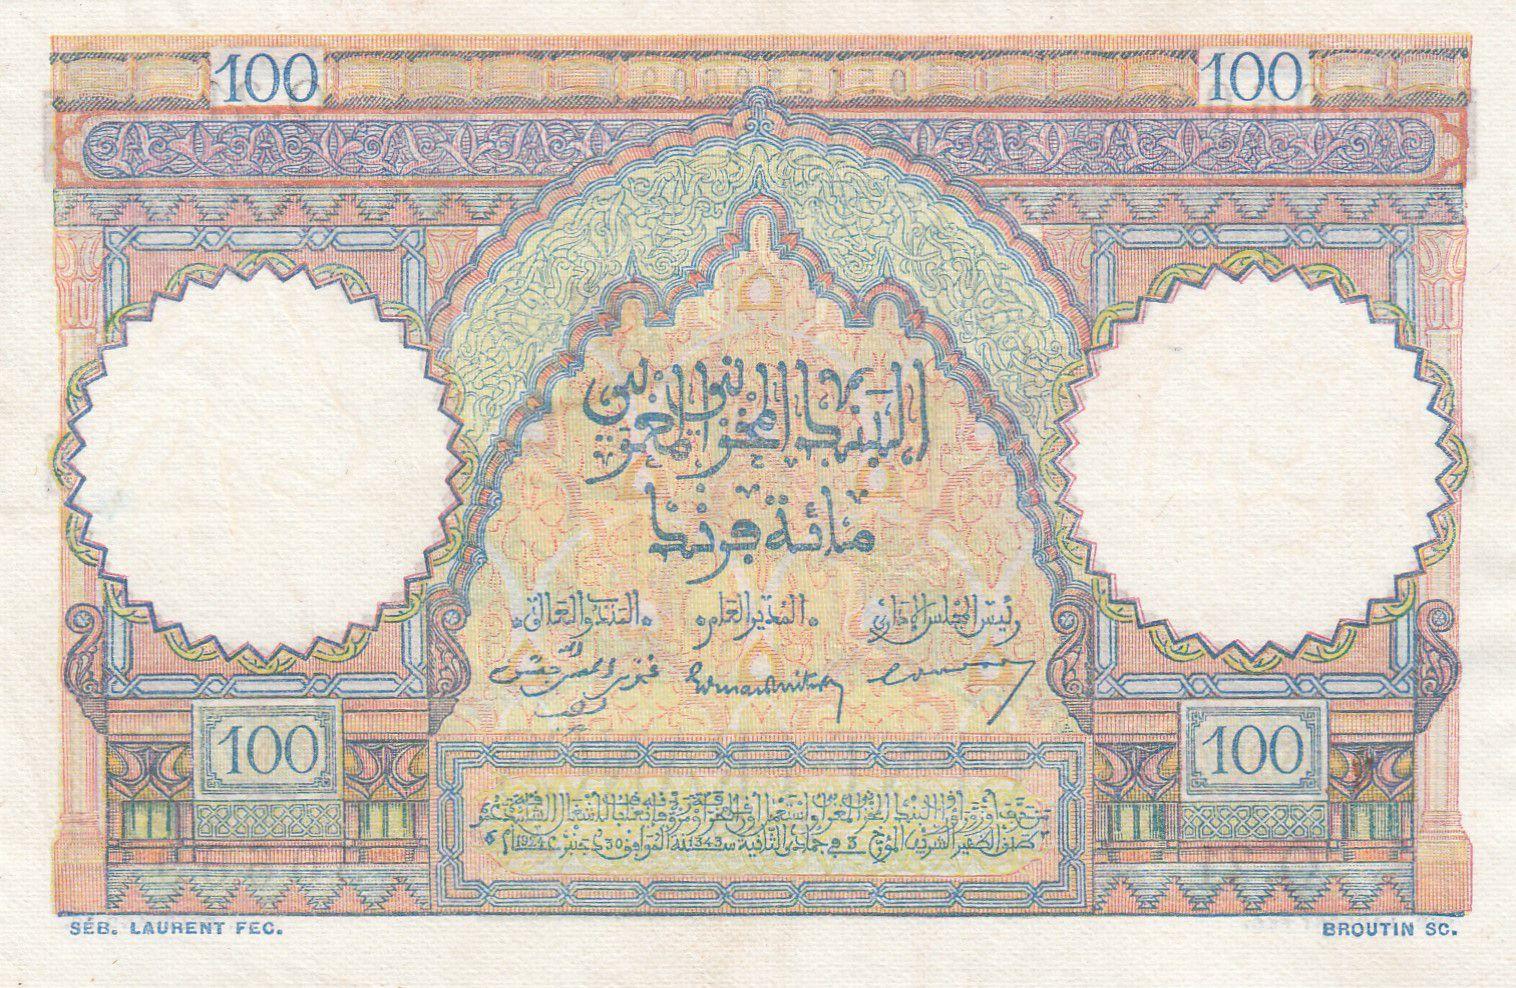 Maroc 100 Francs - Ksar d\'Aït-ben-haddou - 09-01-1950 - SUP - Série Q.21 - P.45